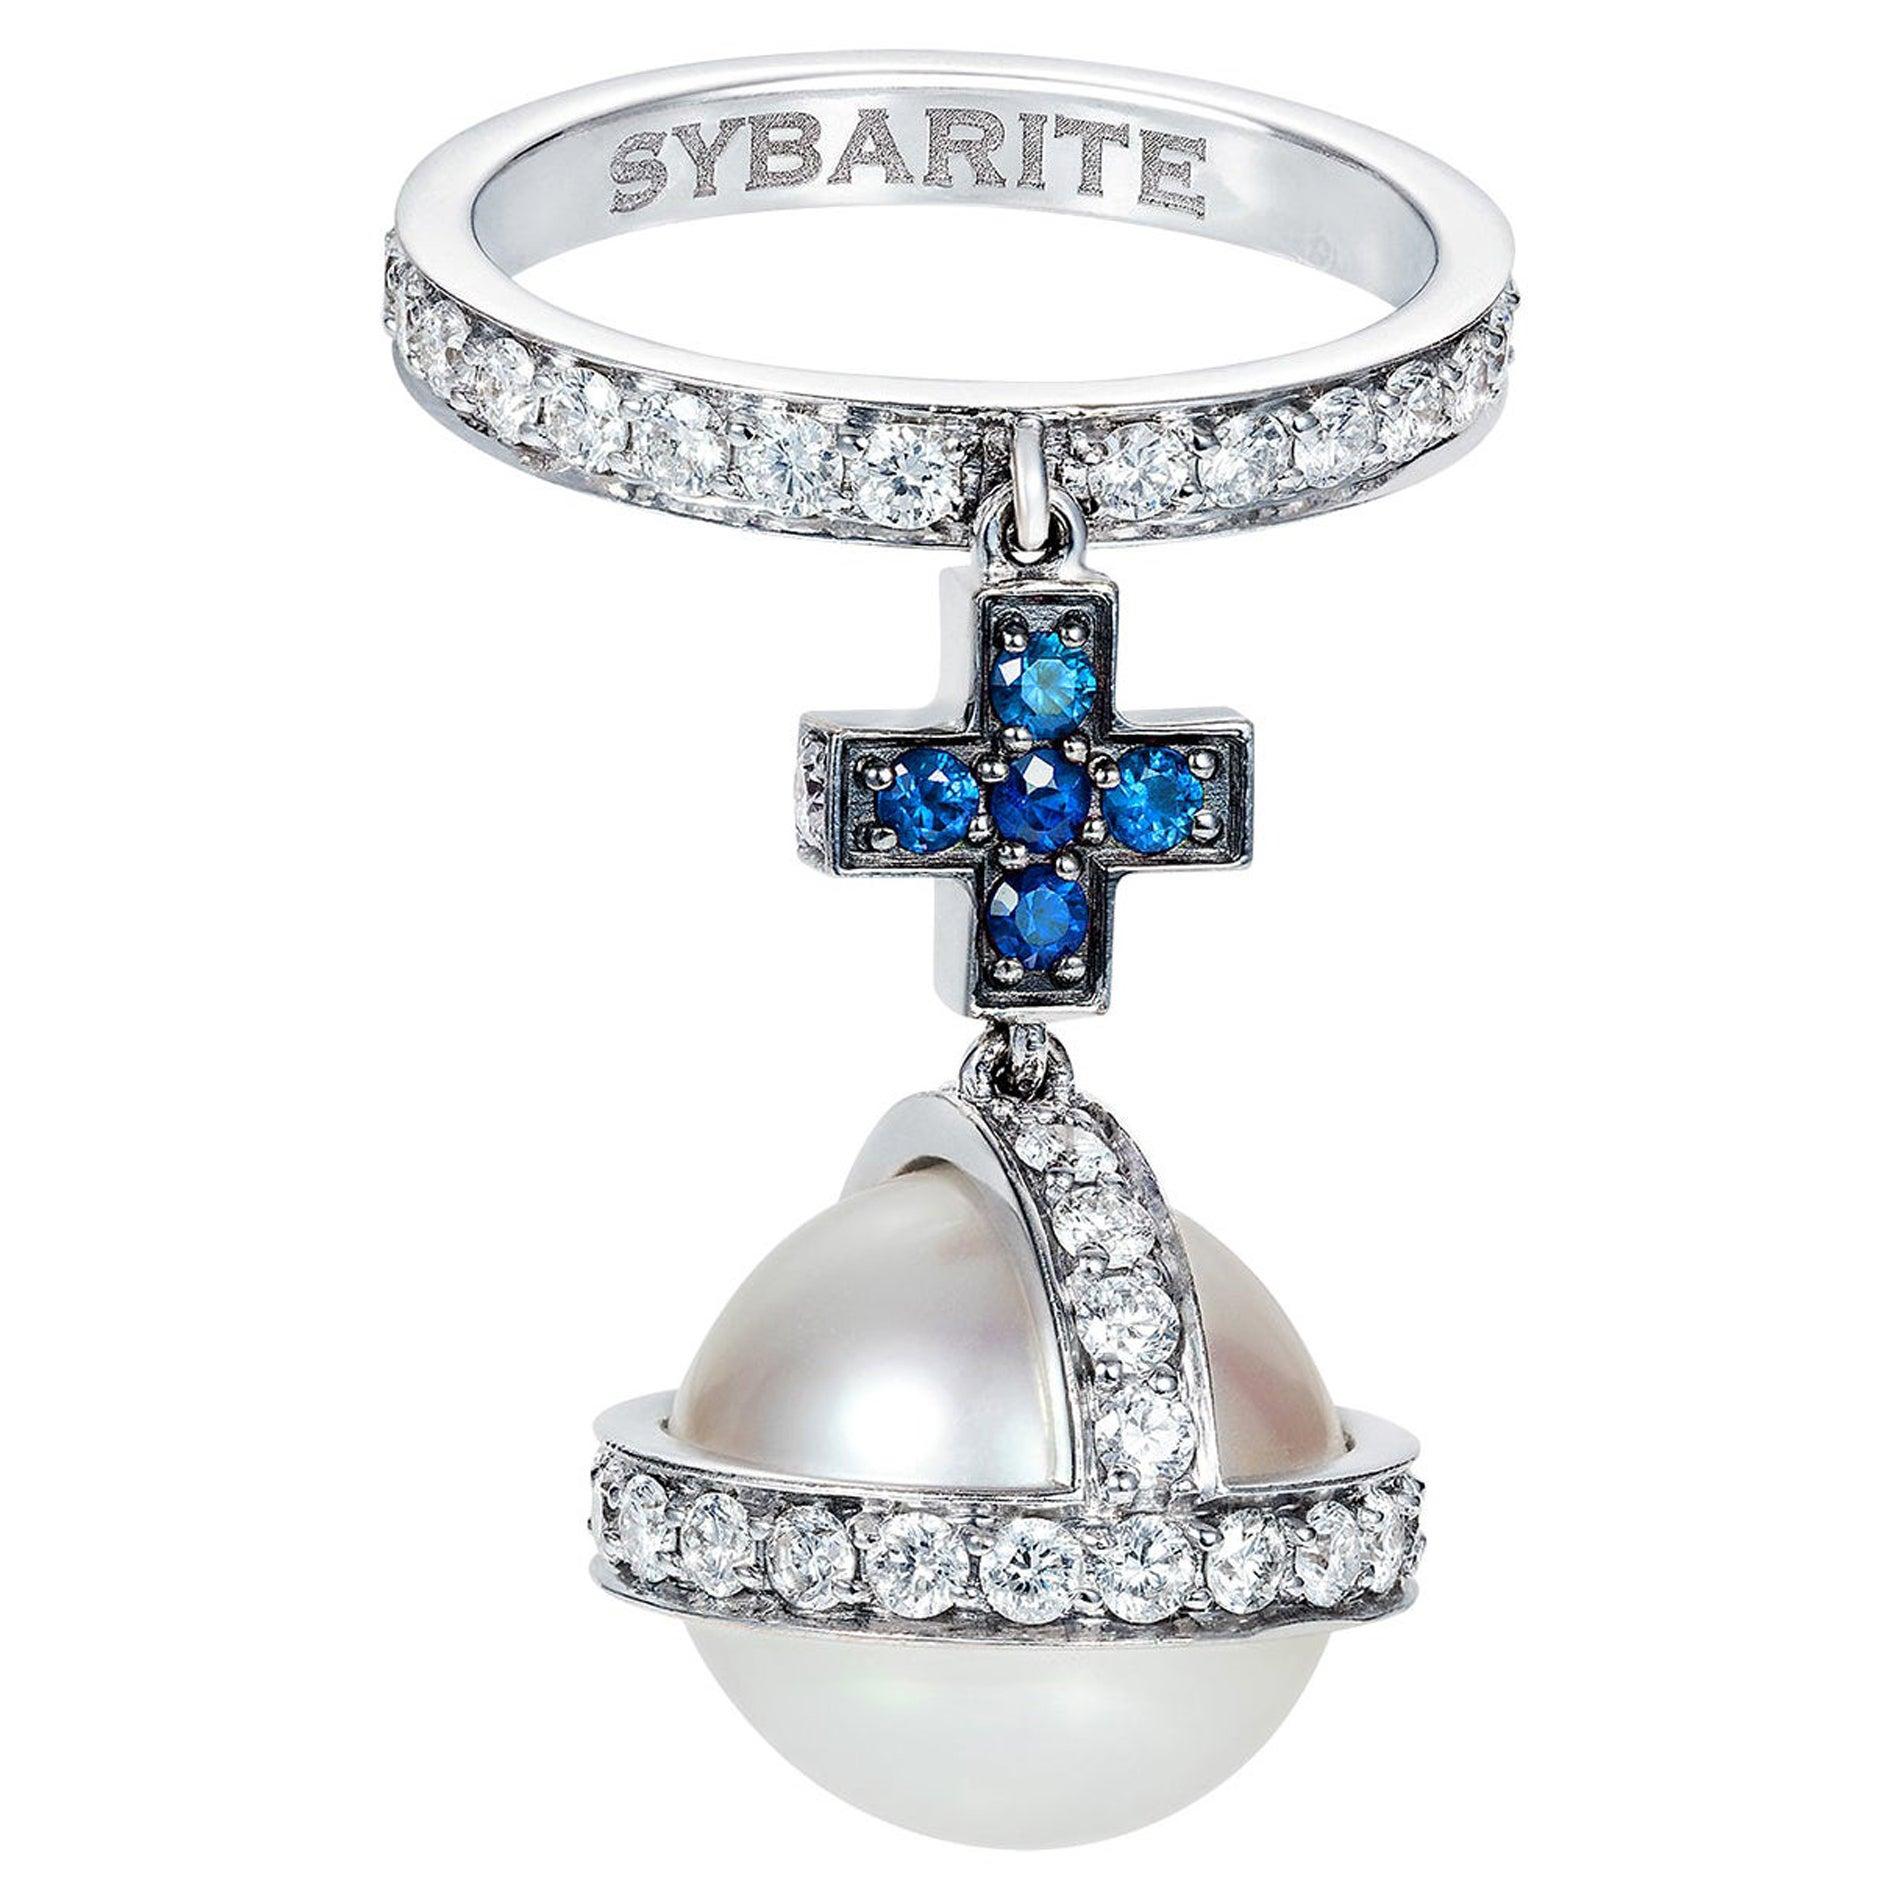 Sybarite Jewellery 18 Karat White Gold 1.46 Carats White Diamonds Dangle Ring